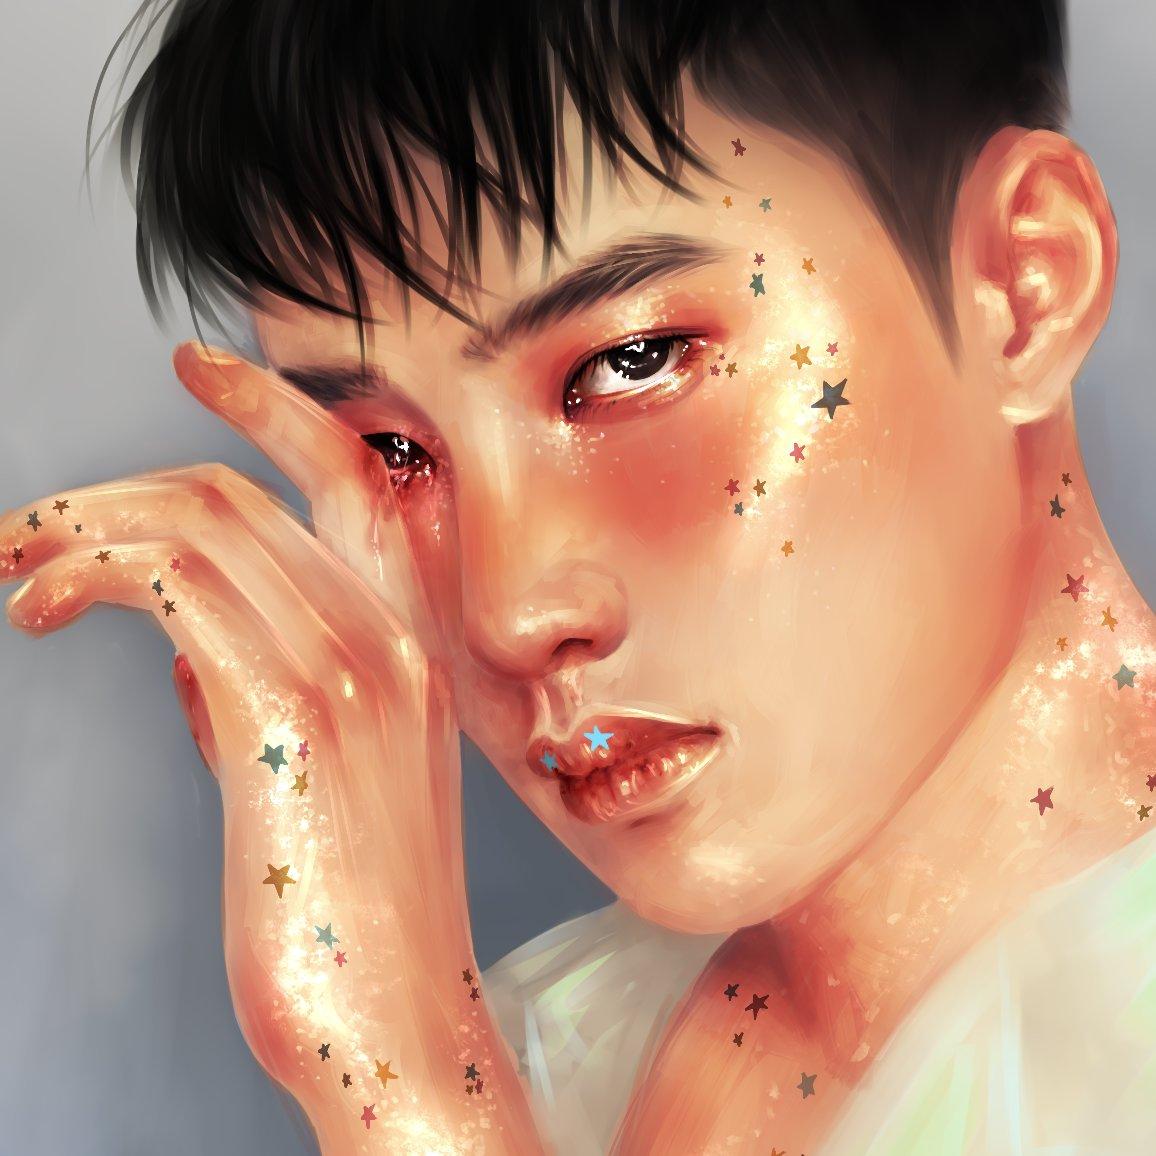 RT @dali_a_rt: 경수야 생일축하해~ #PrinceKyungsooDay #HappyKyungsooDay  #kyungsoo #exo #exofanart #엑소 #경수 #경수야생일축하해 https://t.co/7rRieetHII